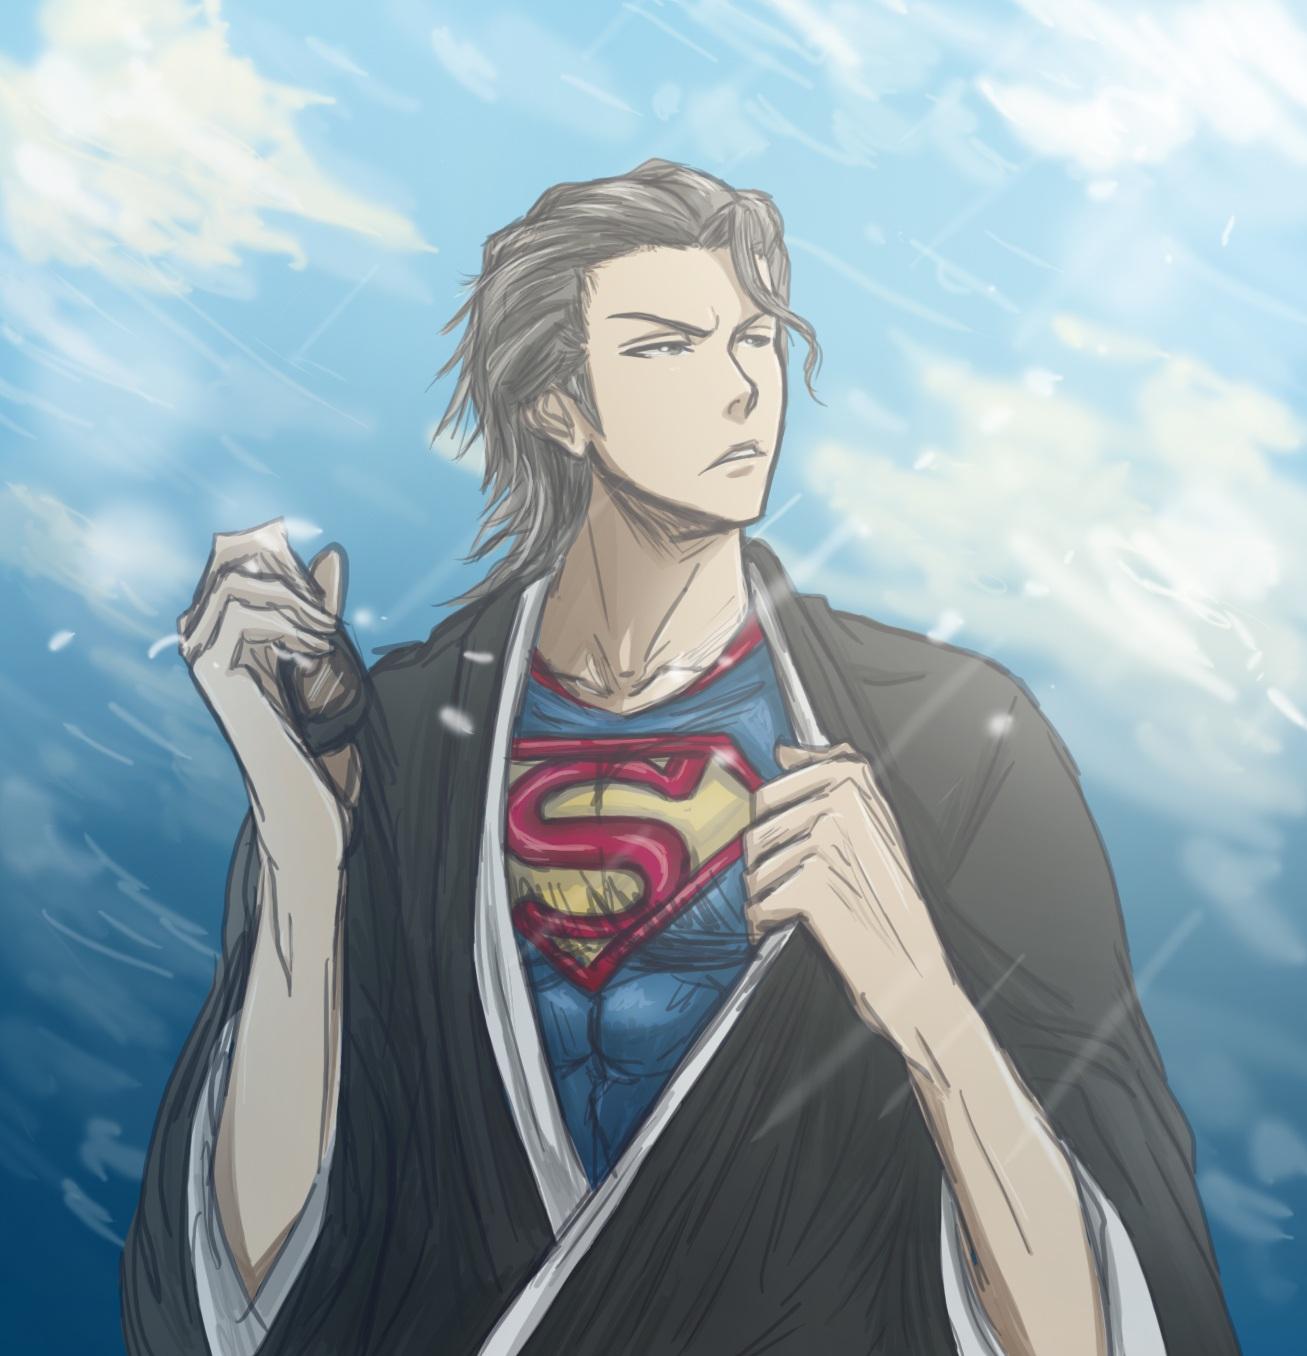 Aizen Sousuke, BLEACH | page 5 - Zerochan Anime Image Board